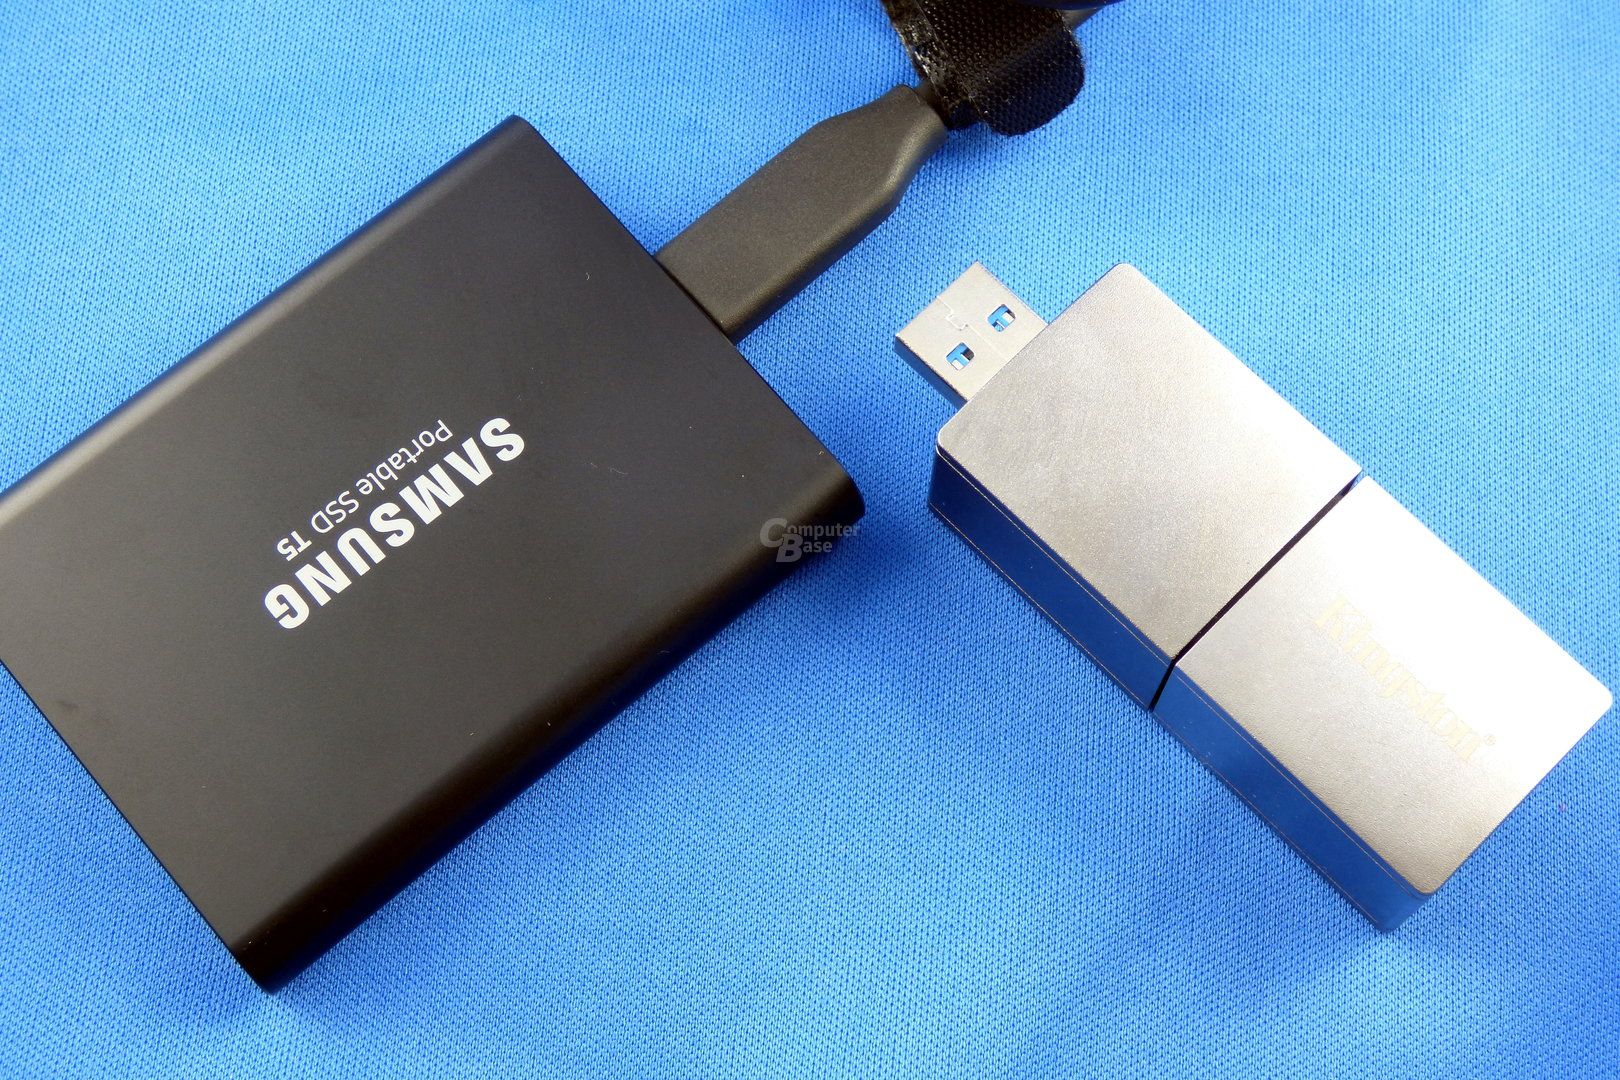 Samsung Portable SSD T5 (links), Kingston DataTraveler Ultimate GT (rechts)